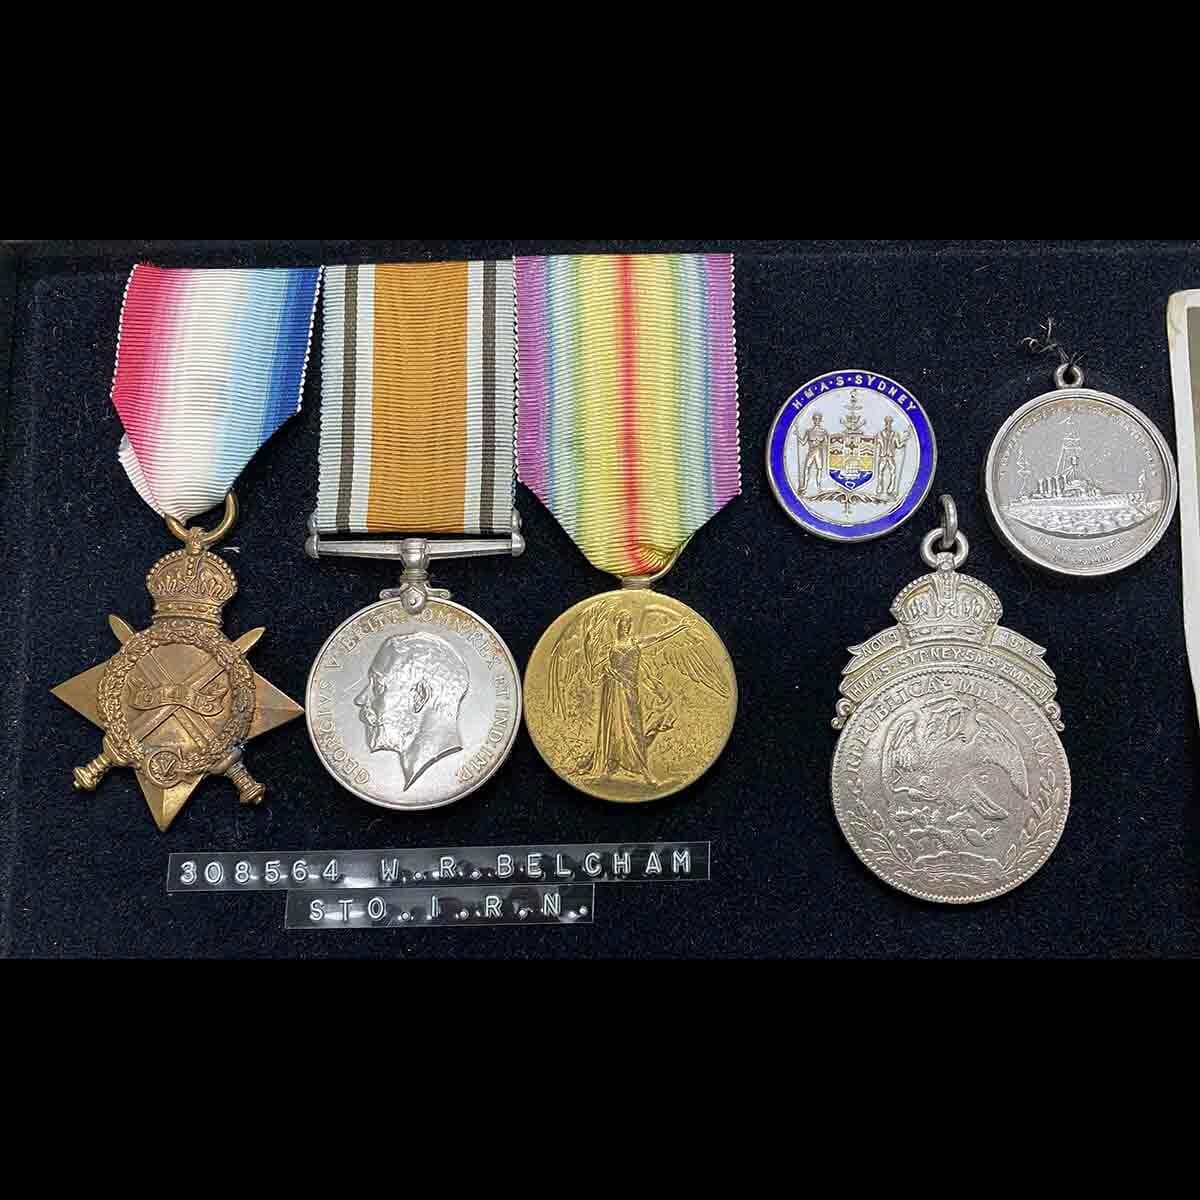 Sydney Emden Medal Group RAN Australia Original CREW 4